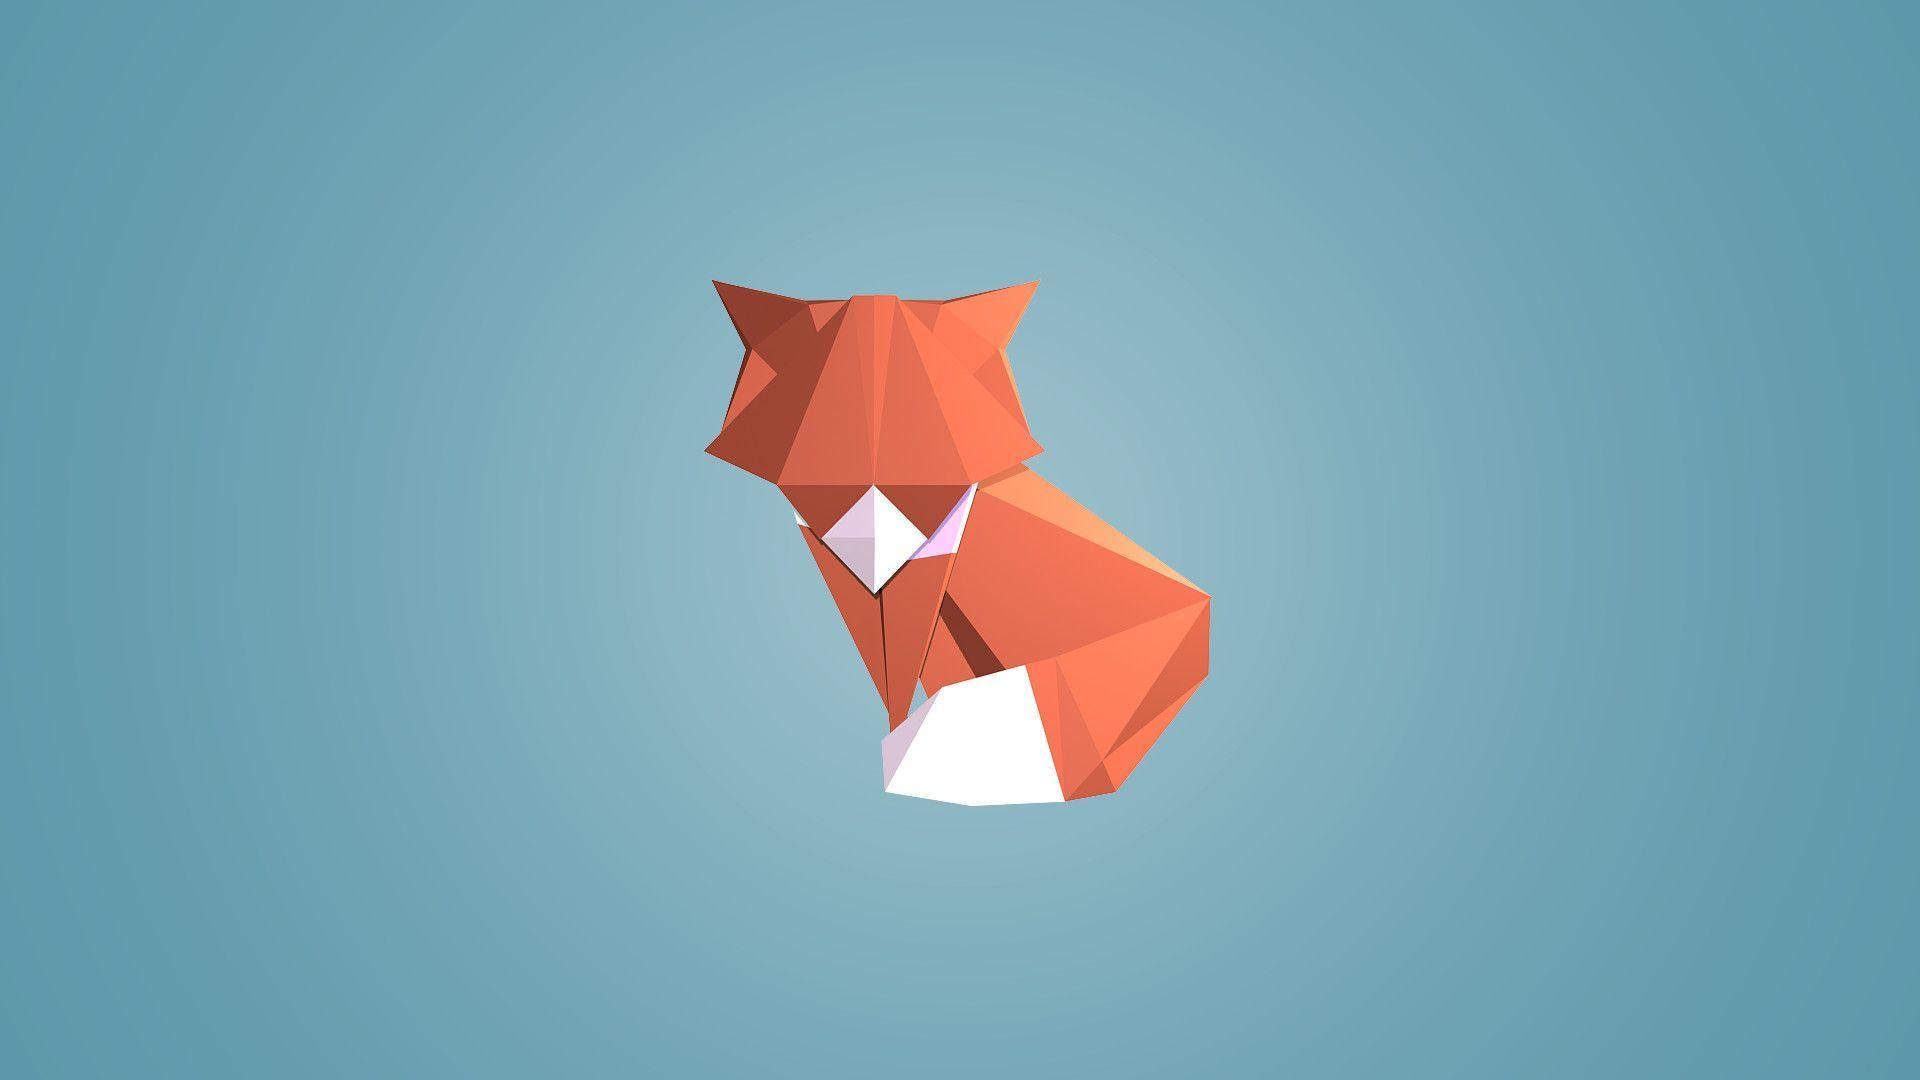 Simple Geometric Hd Wallpapers Top Free Simple Geometric